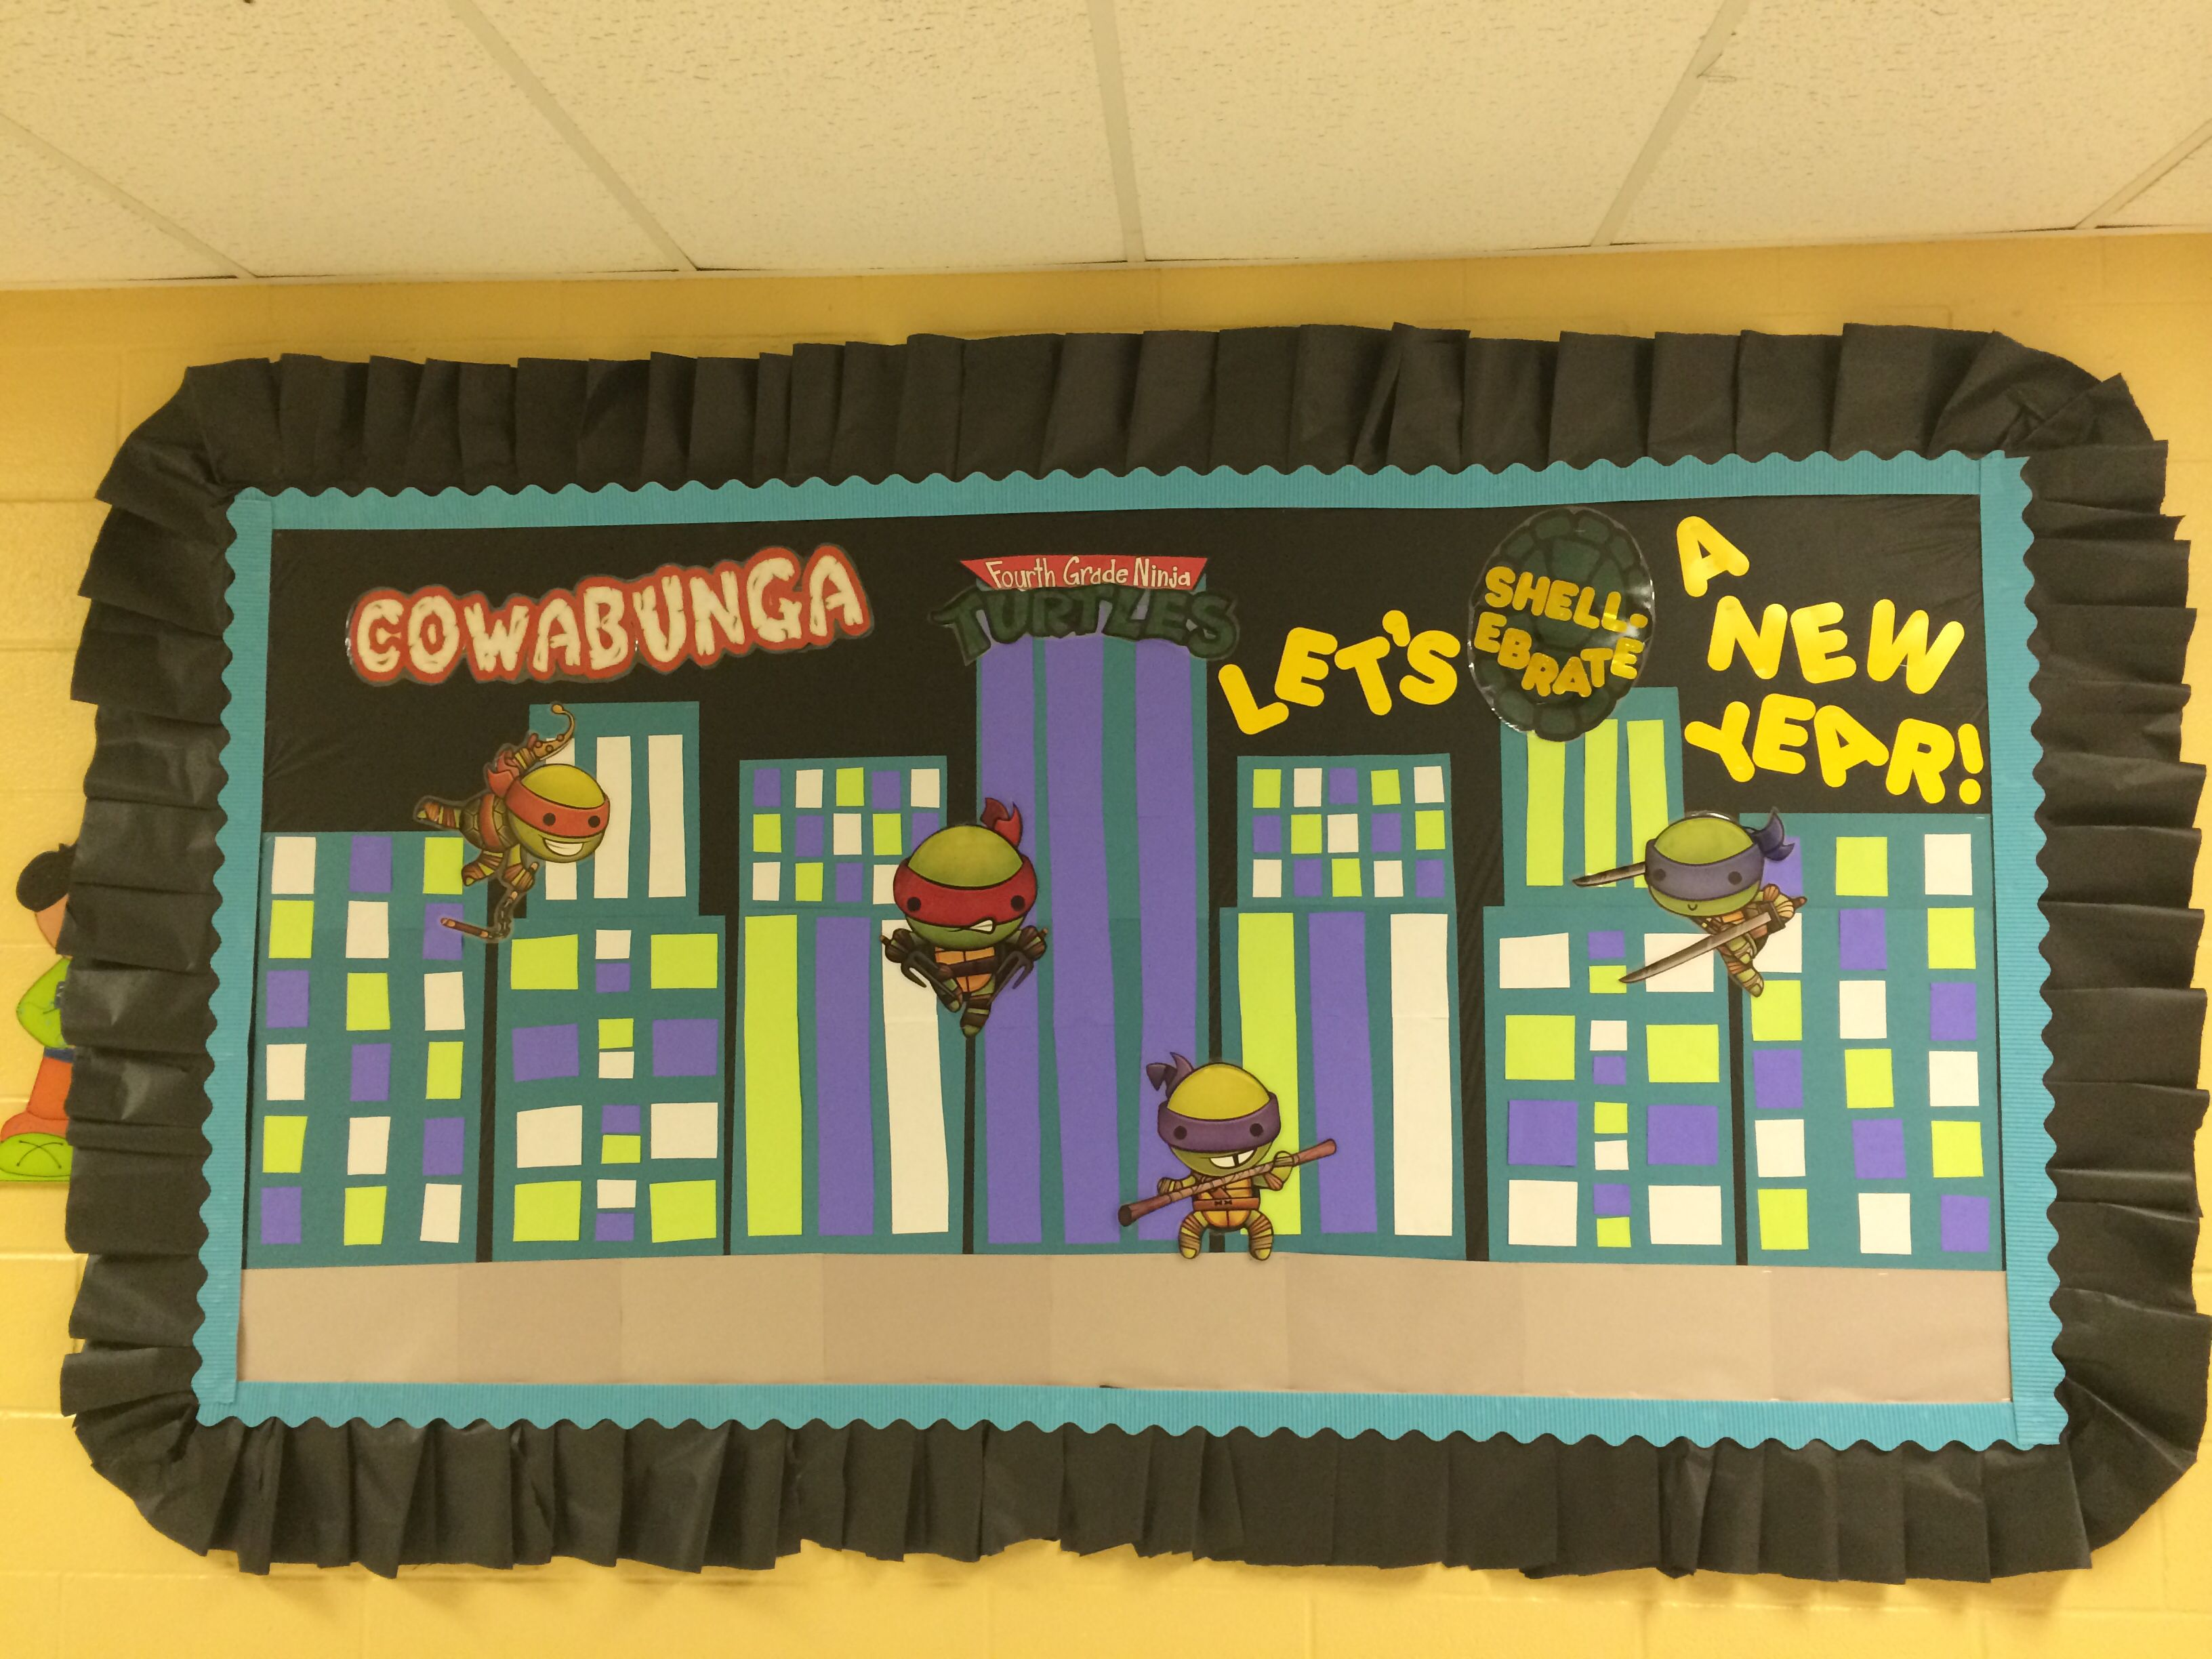 Back To School Ninja Turtle Bulletin Board Cowabunga Fourth Grade Ninja Turtles Let S Shell